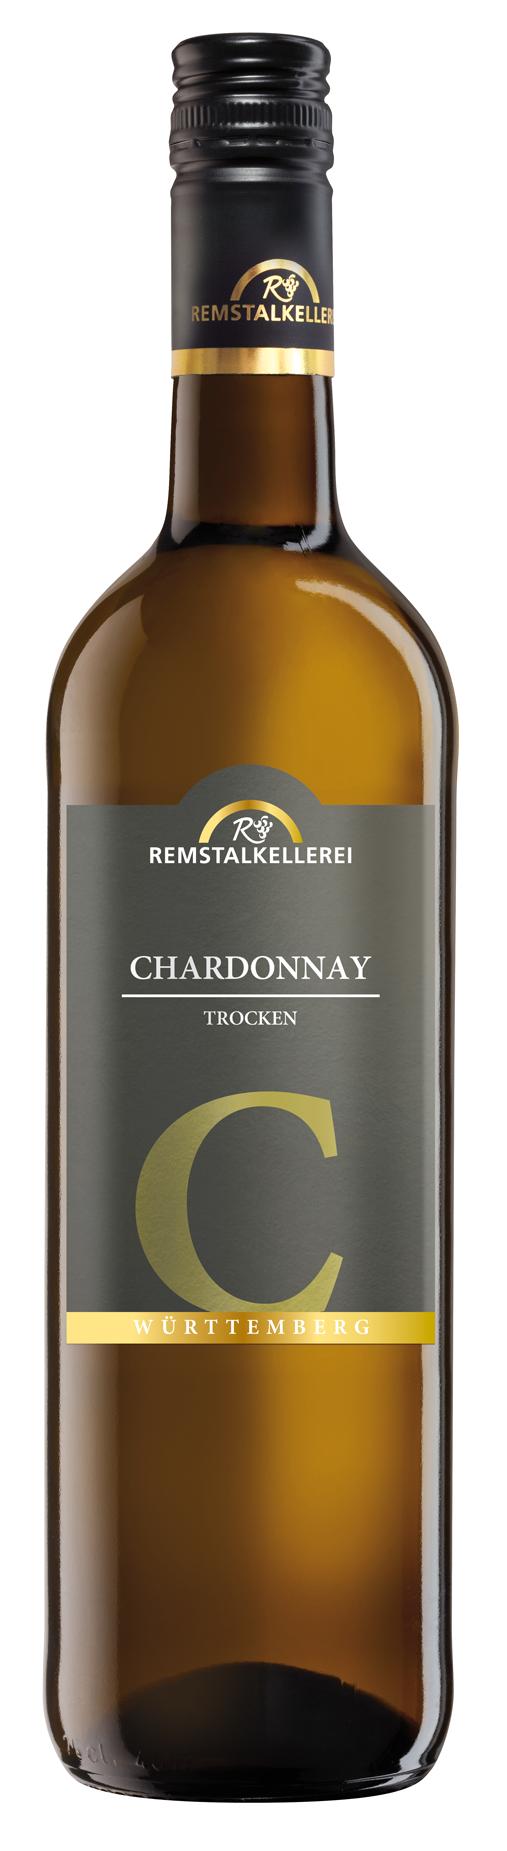 "Chardonnay ""C"" trocken"